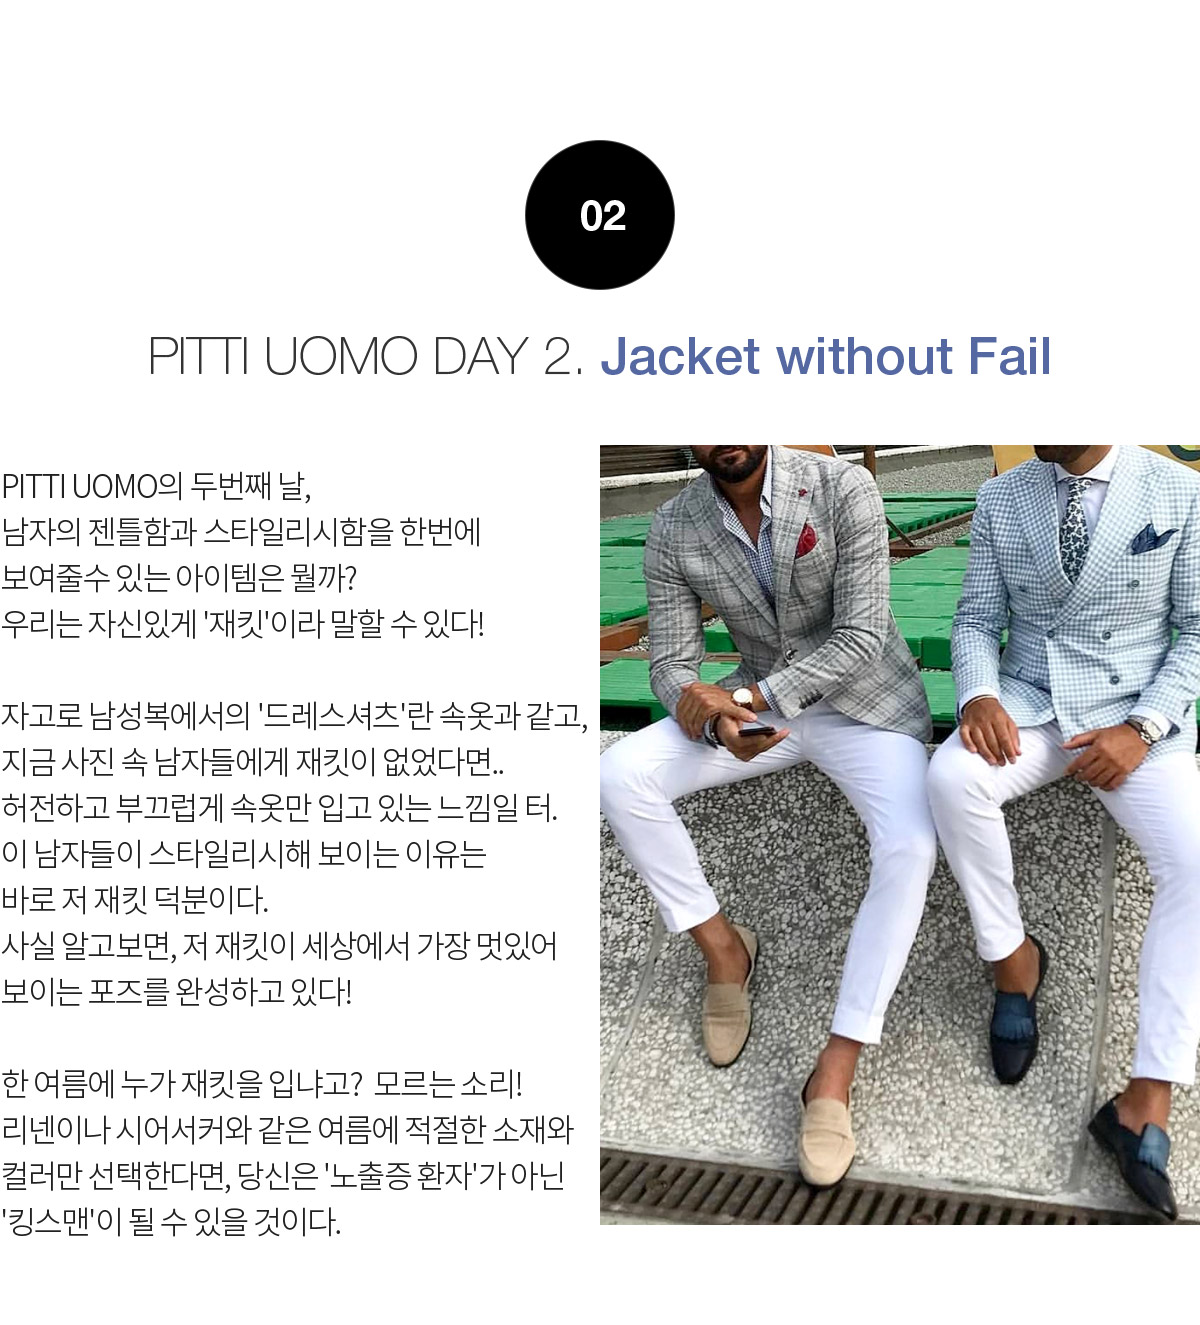 PITTI UOMO DAY 2. Jacket without Fail